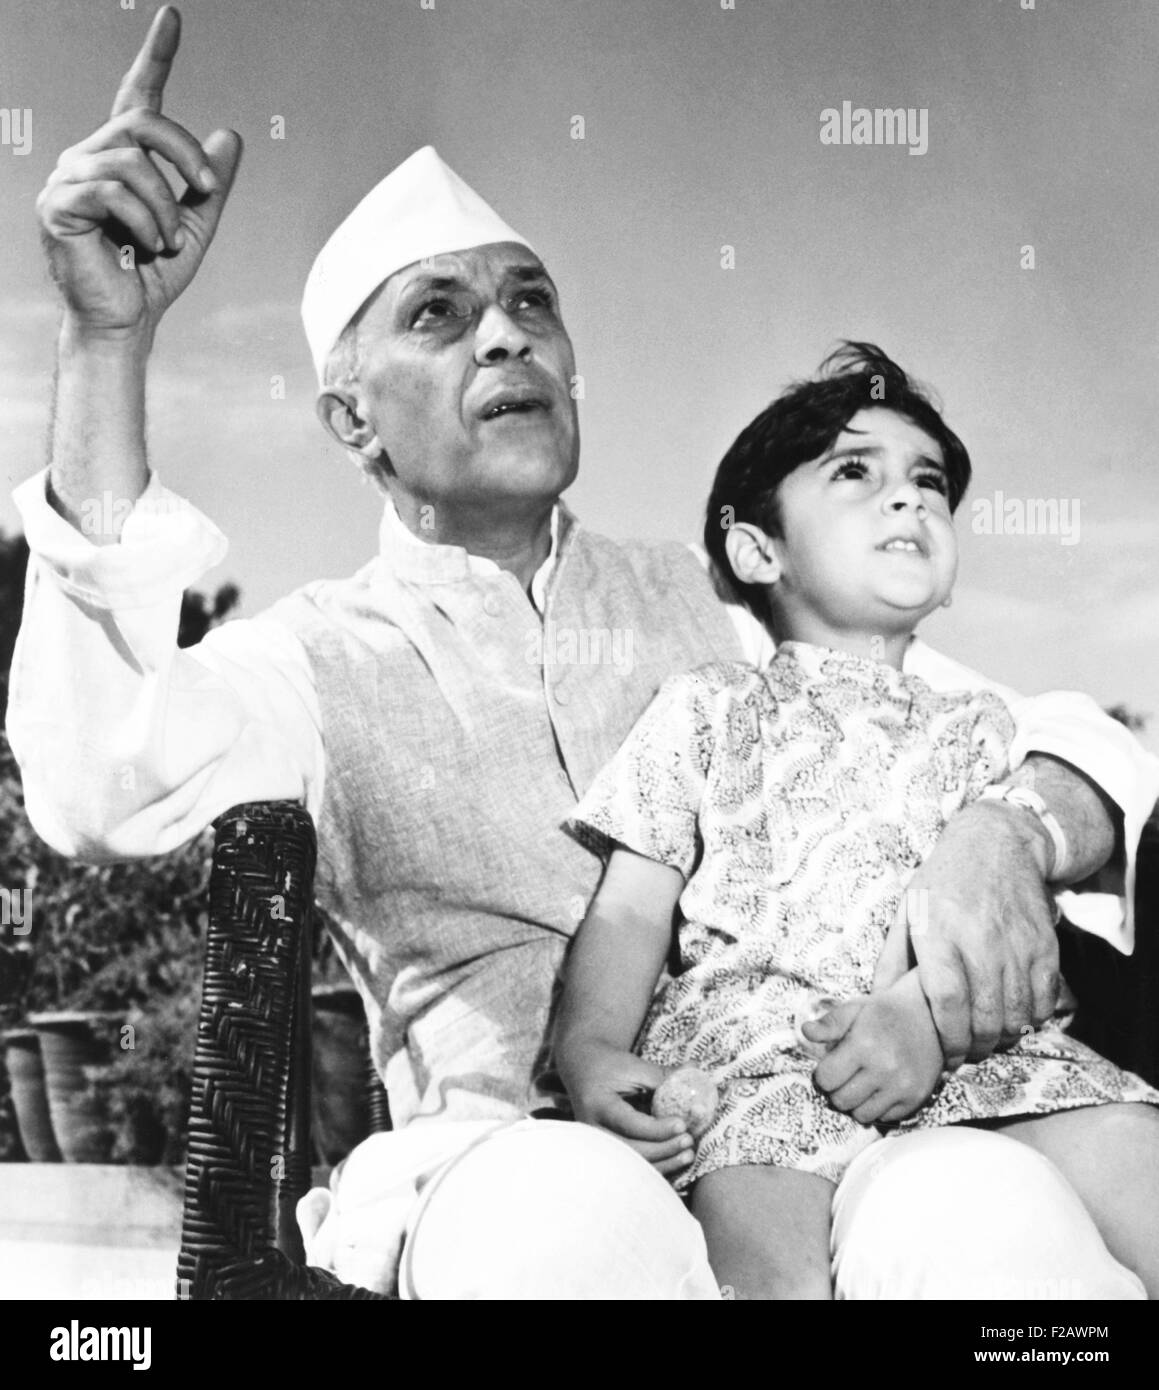 Jawaharlal Nehru, Premier of India, is shown talking with his 3-year-old grandson, Rajiva Gandhi. Rajiva became - Stock Image